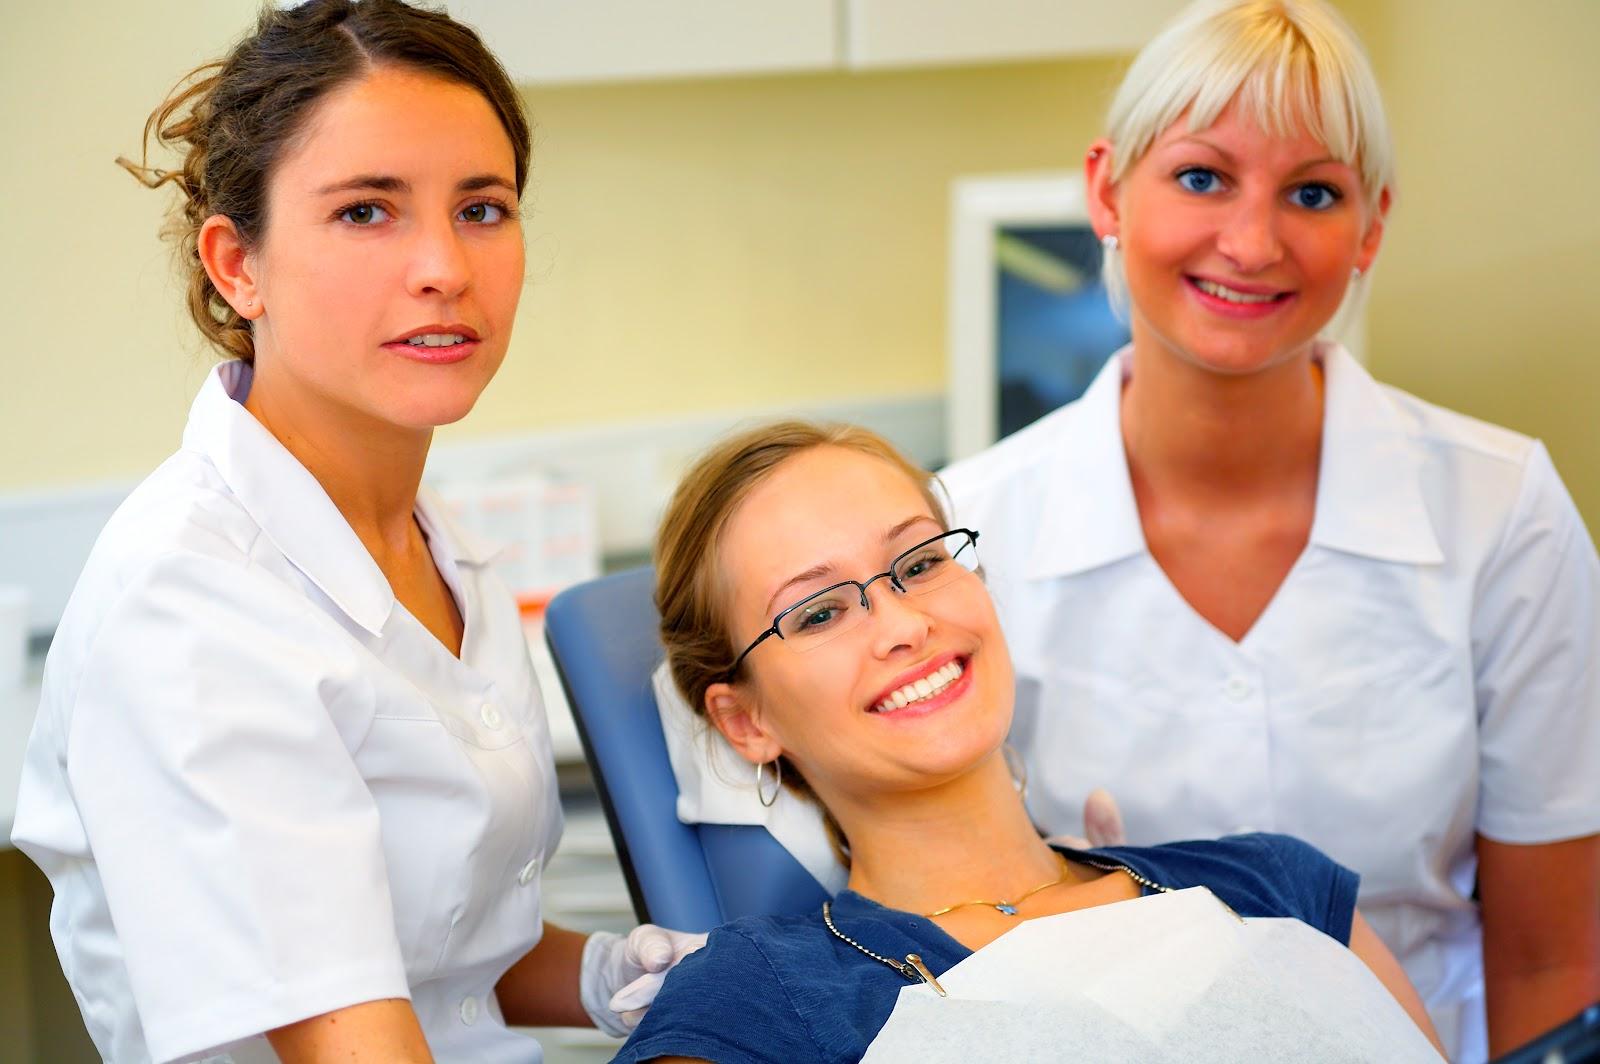 Dr. Wells 維格牙醫診所--臺北石牌牙醫 植牙 矯正 微笑設計 美白: [牙新聞] 一個看牙醫的好理由